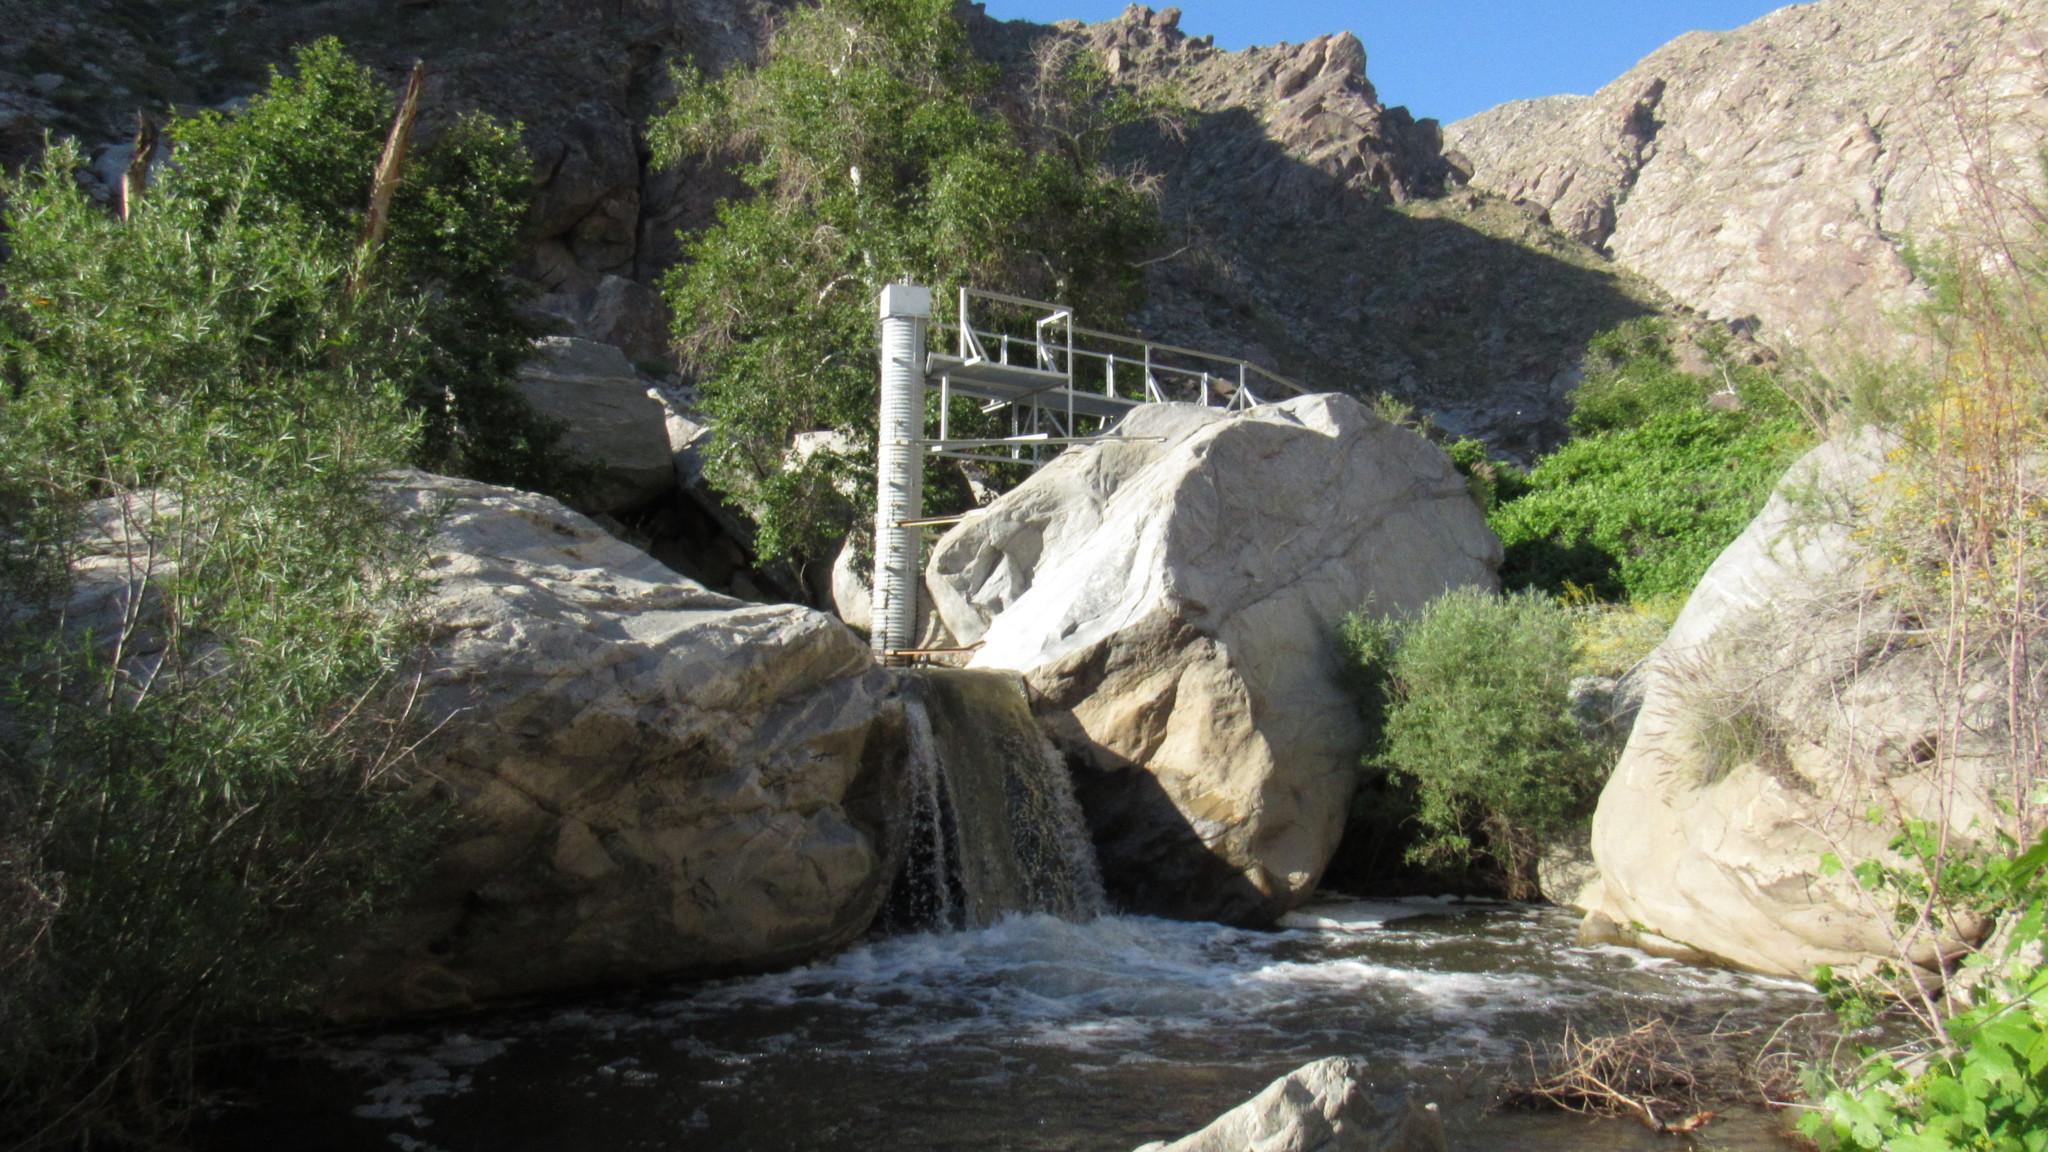 Tahquitz-Canyon-6-1.jpg